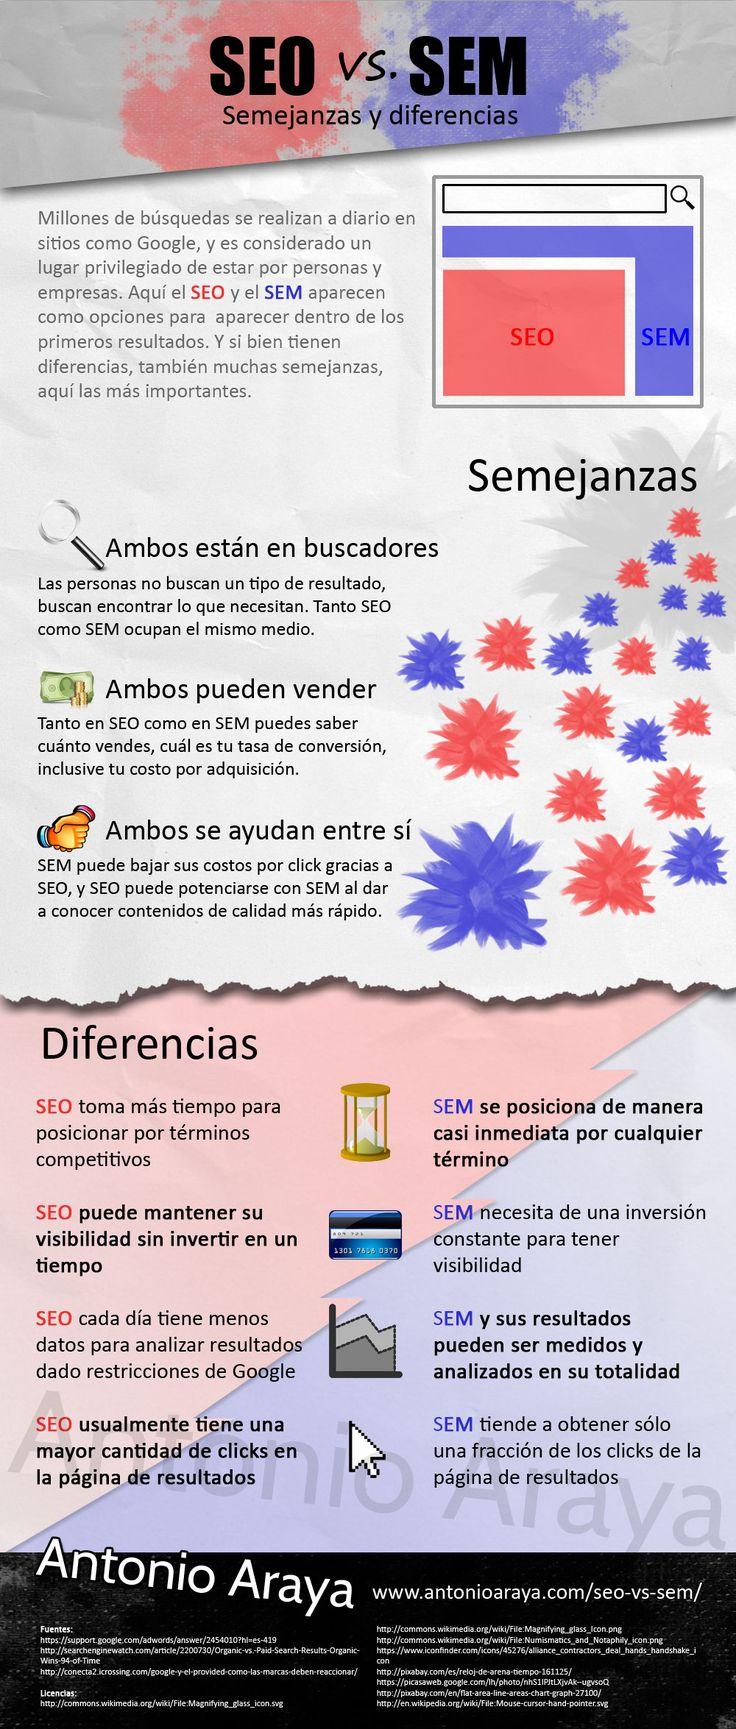 SEO vs SEM: semejanzas y diferencias Vía: www.antonioaraya.com #infografia #infographic #seo #marketing